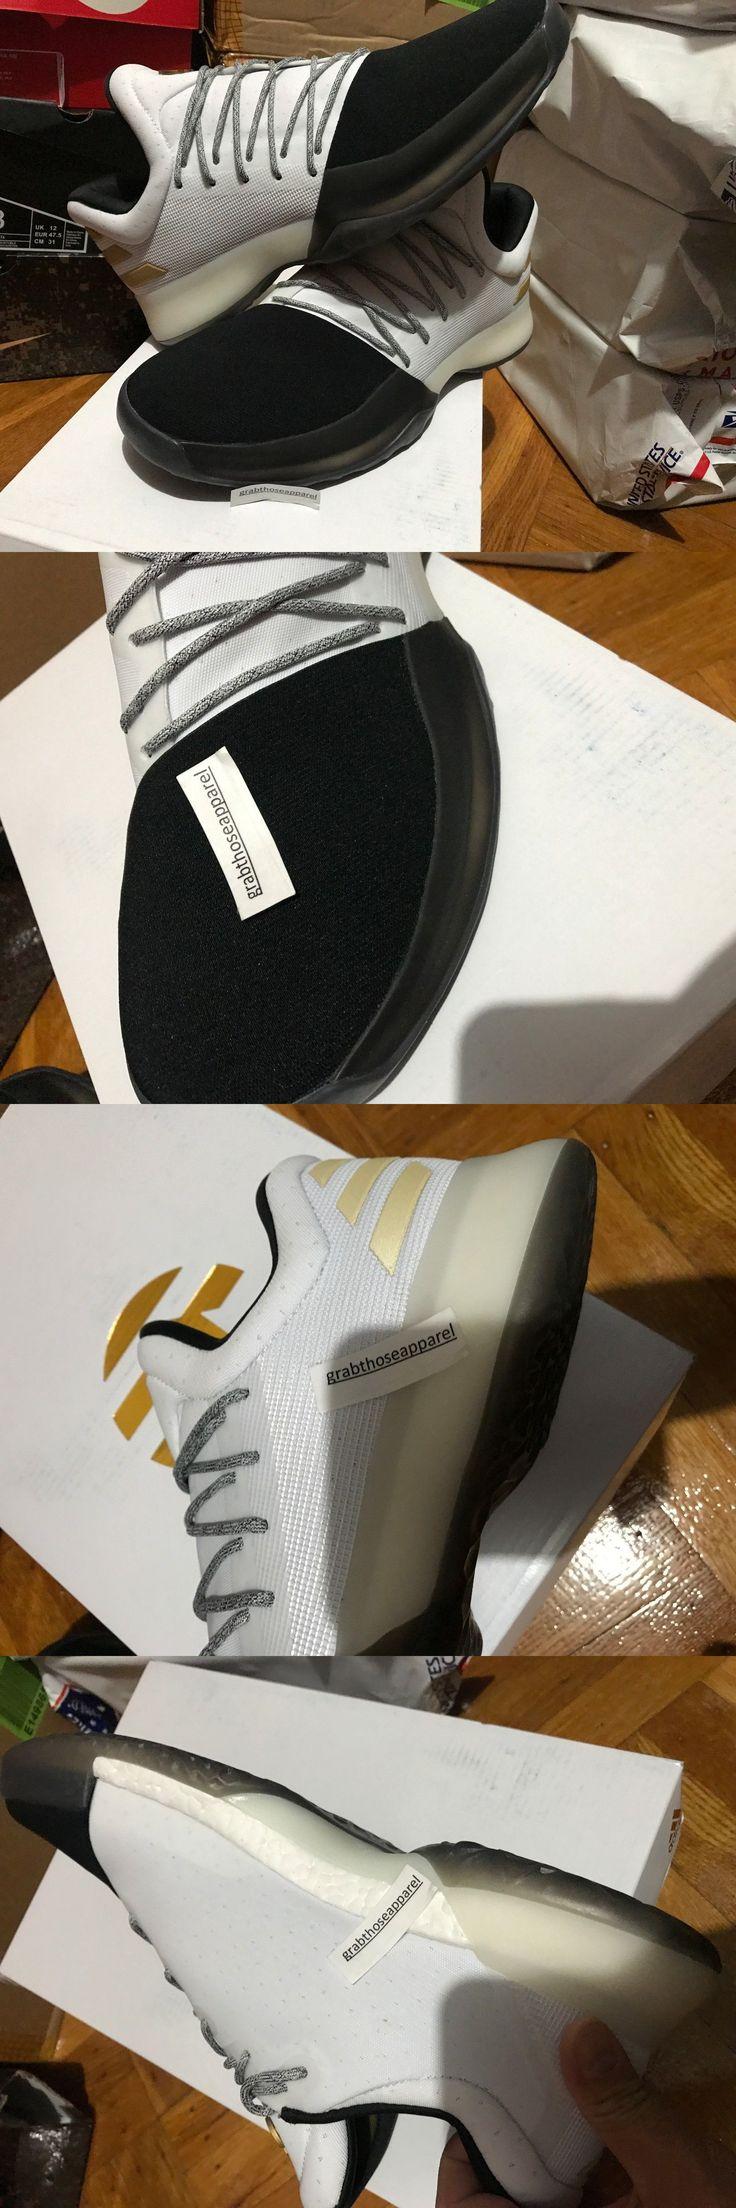 Men 158971: Adidas Originals Harden Vol 1 White Black Gold Bw0552 Men Size 8-13 100% Authent -> BUY IT NOW ONLY: $255 on eBay!